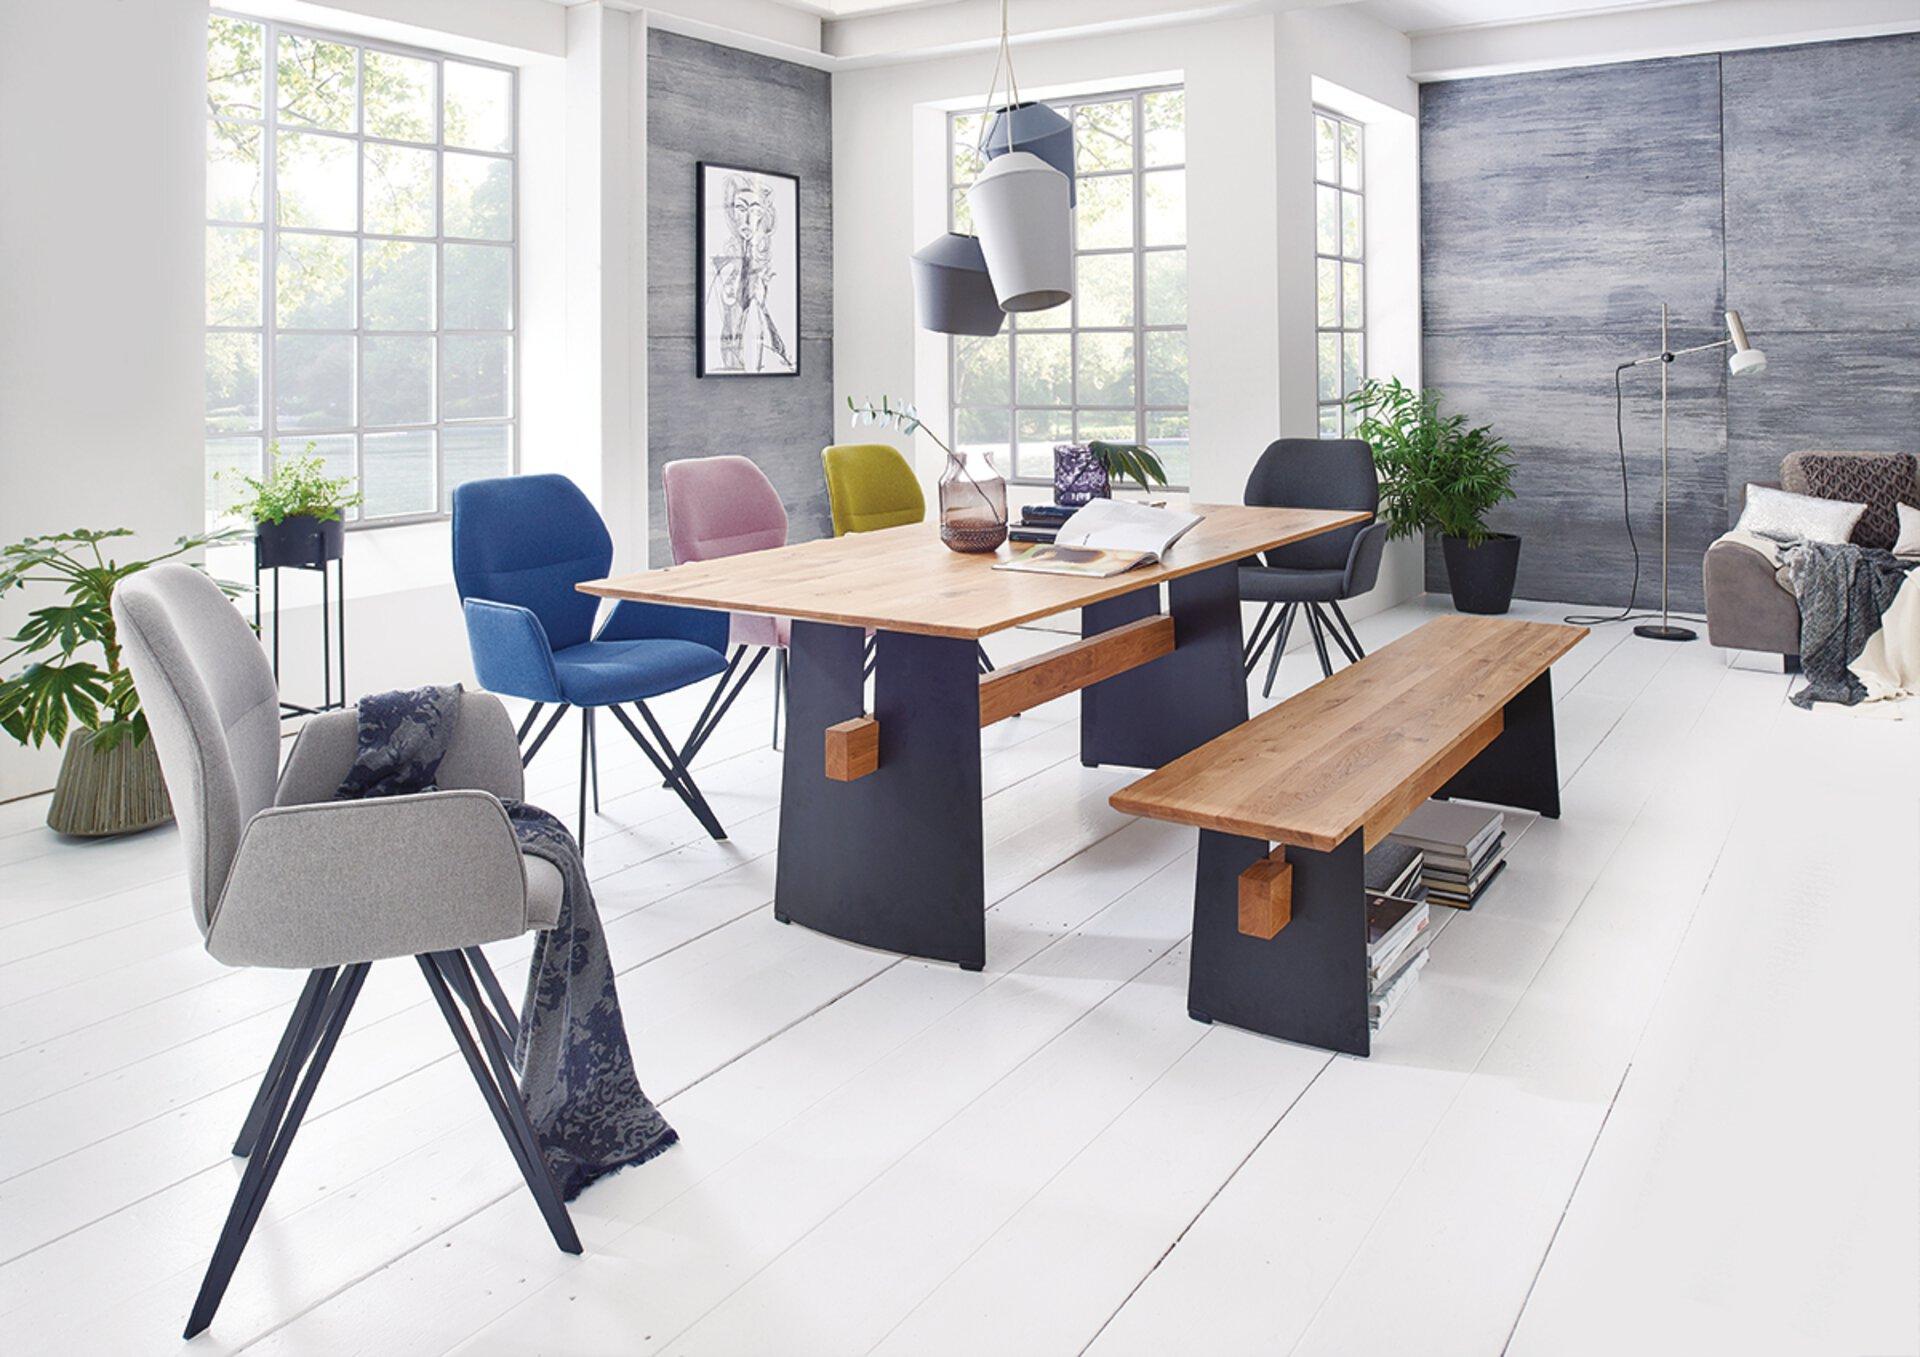 Sitzbank MERLOT Niehoff Sitzmöbel Metall mehrfarbig